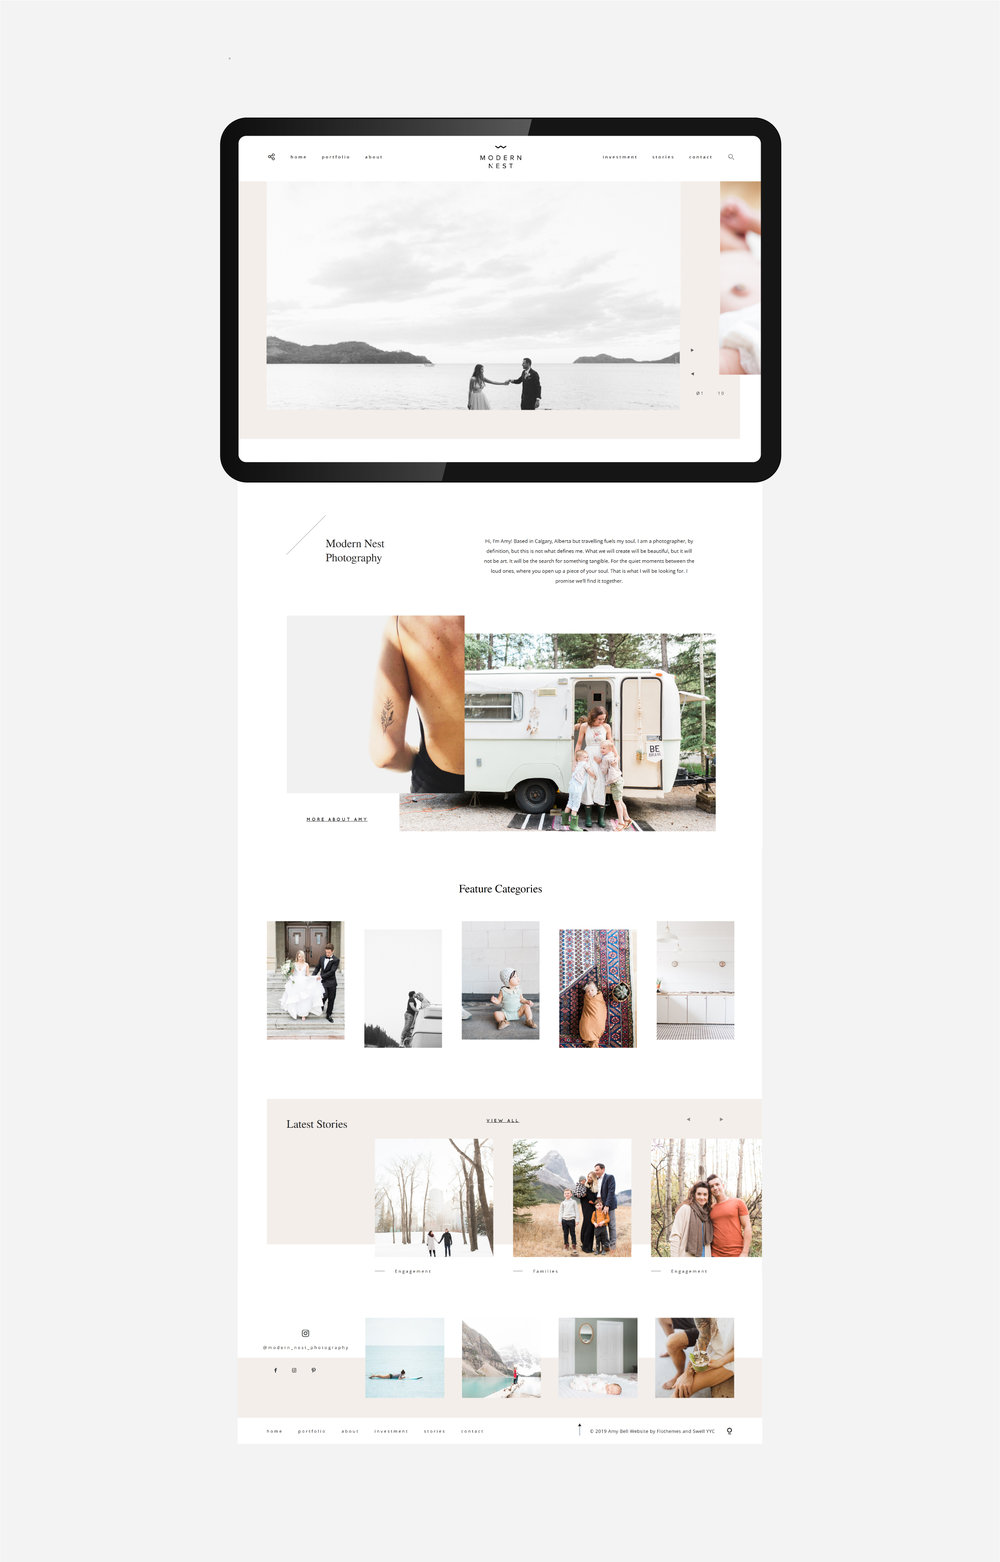 S-website-portfolio-modern-nest-photography-website.jpg